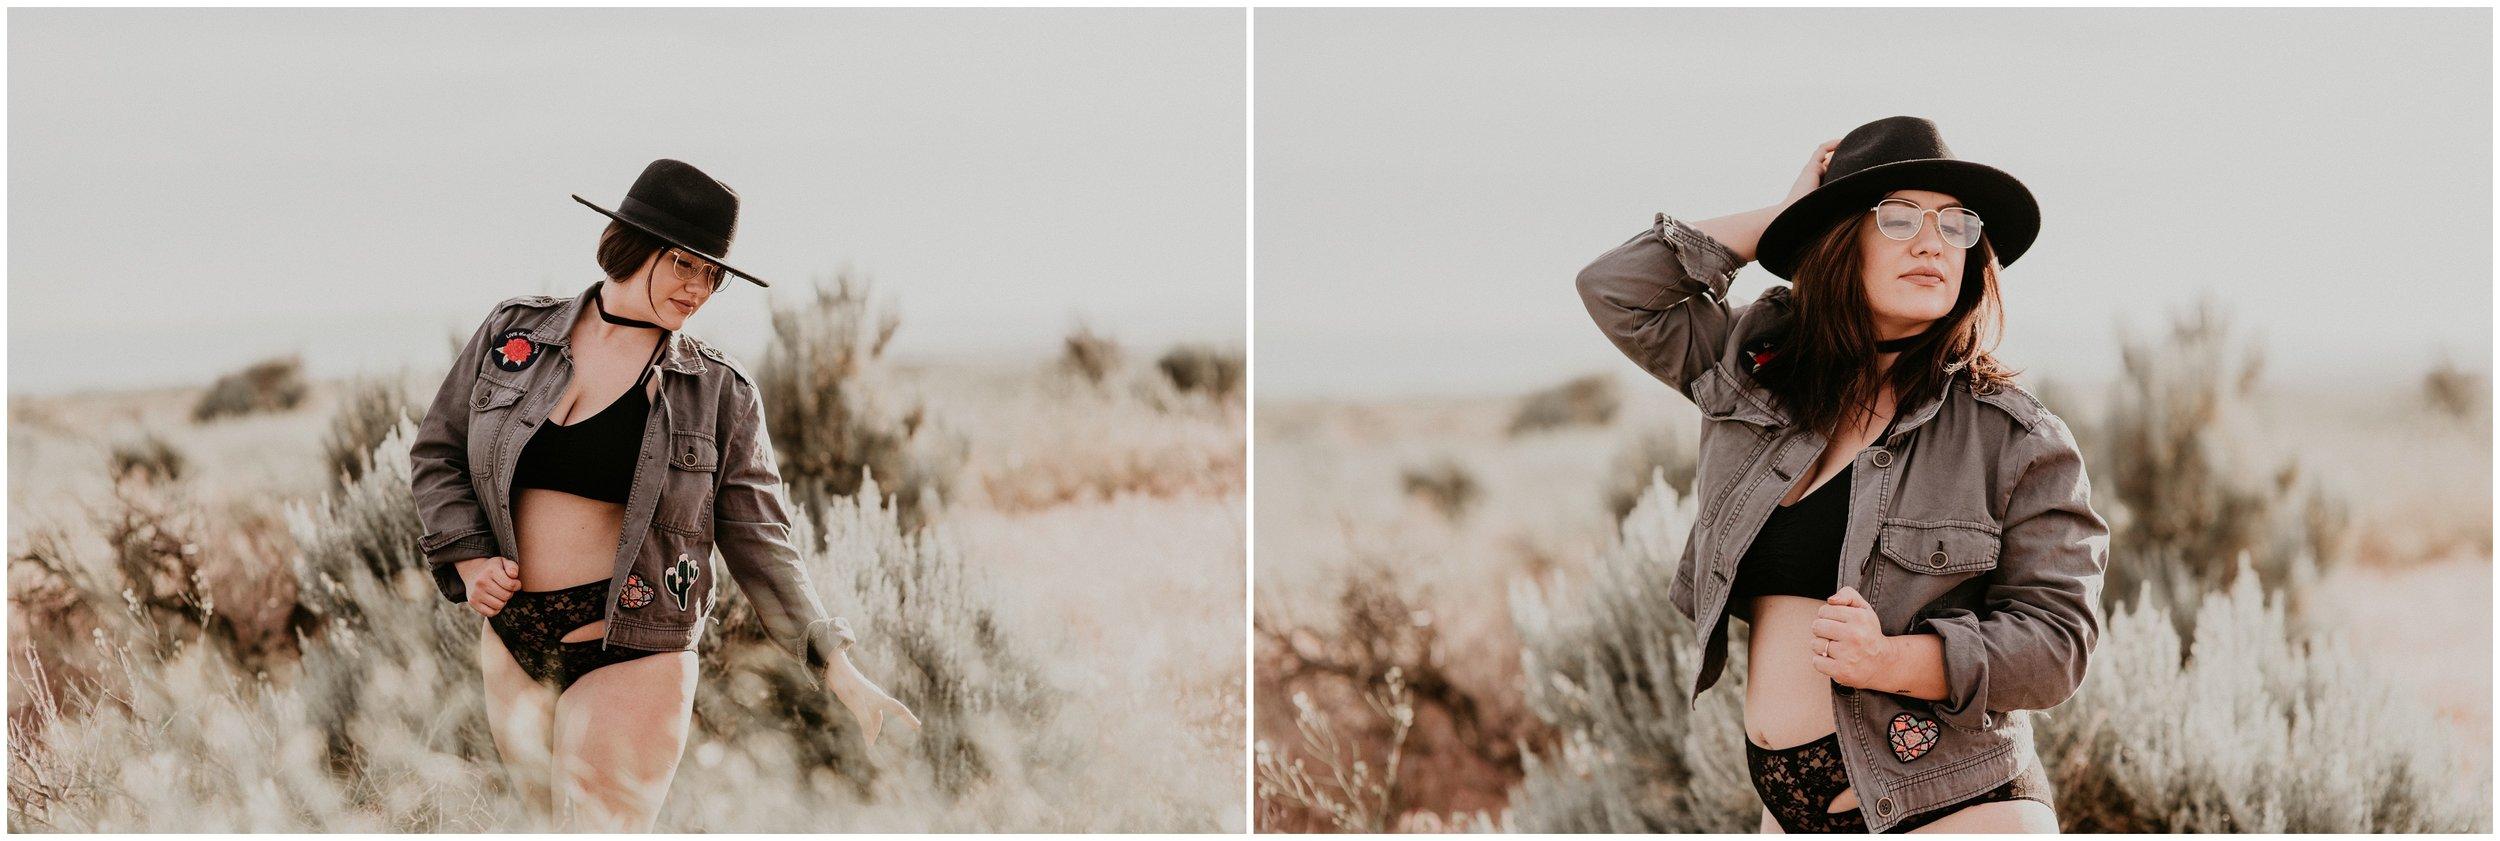 Makayla Madden Photography Boise Idaho Outdoor Boudoir Photographer Boudoir Inspiration Oregon Boudoir Photographer Hipster